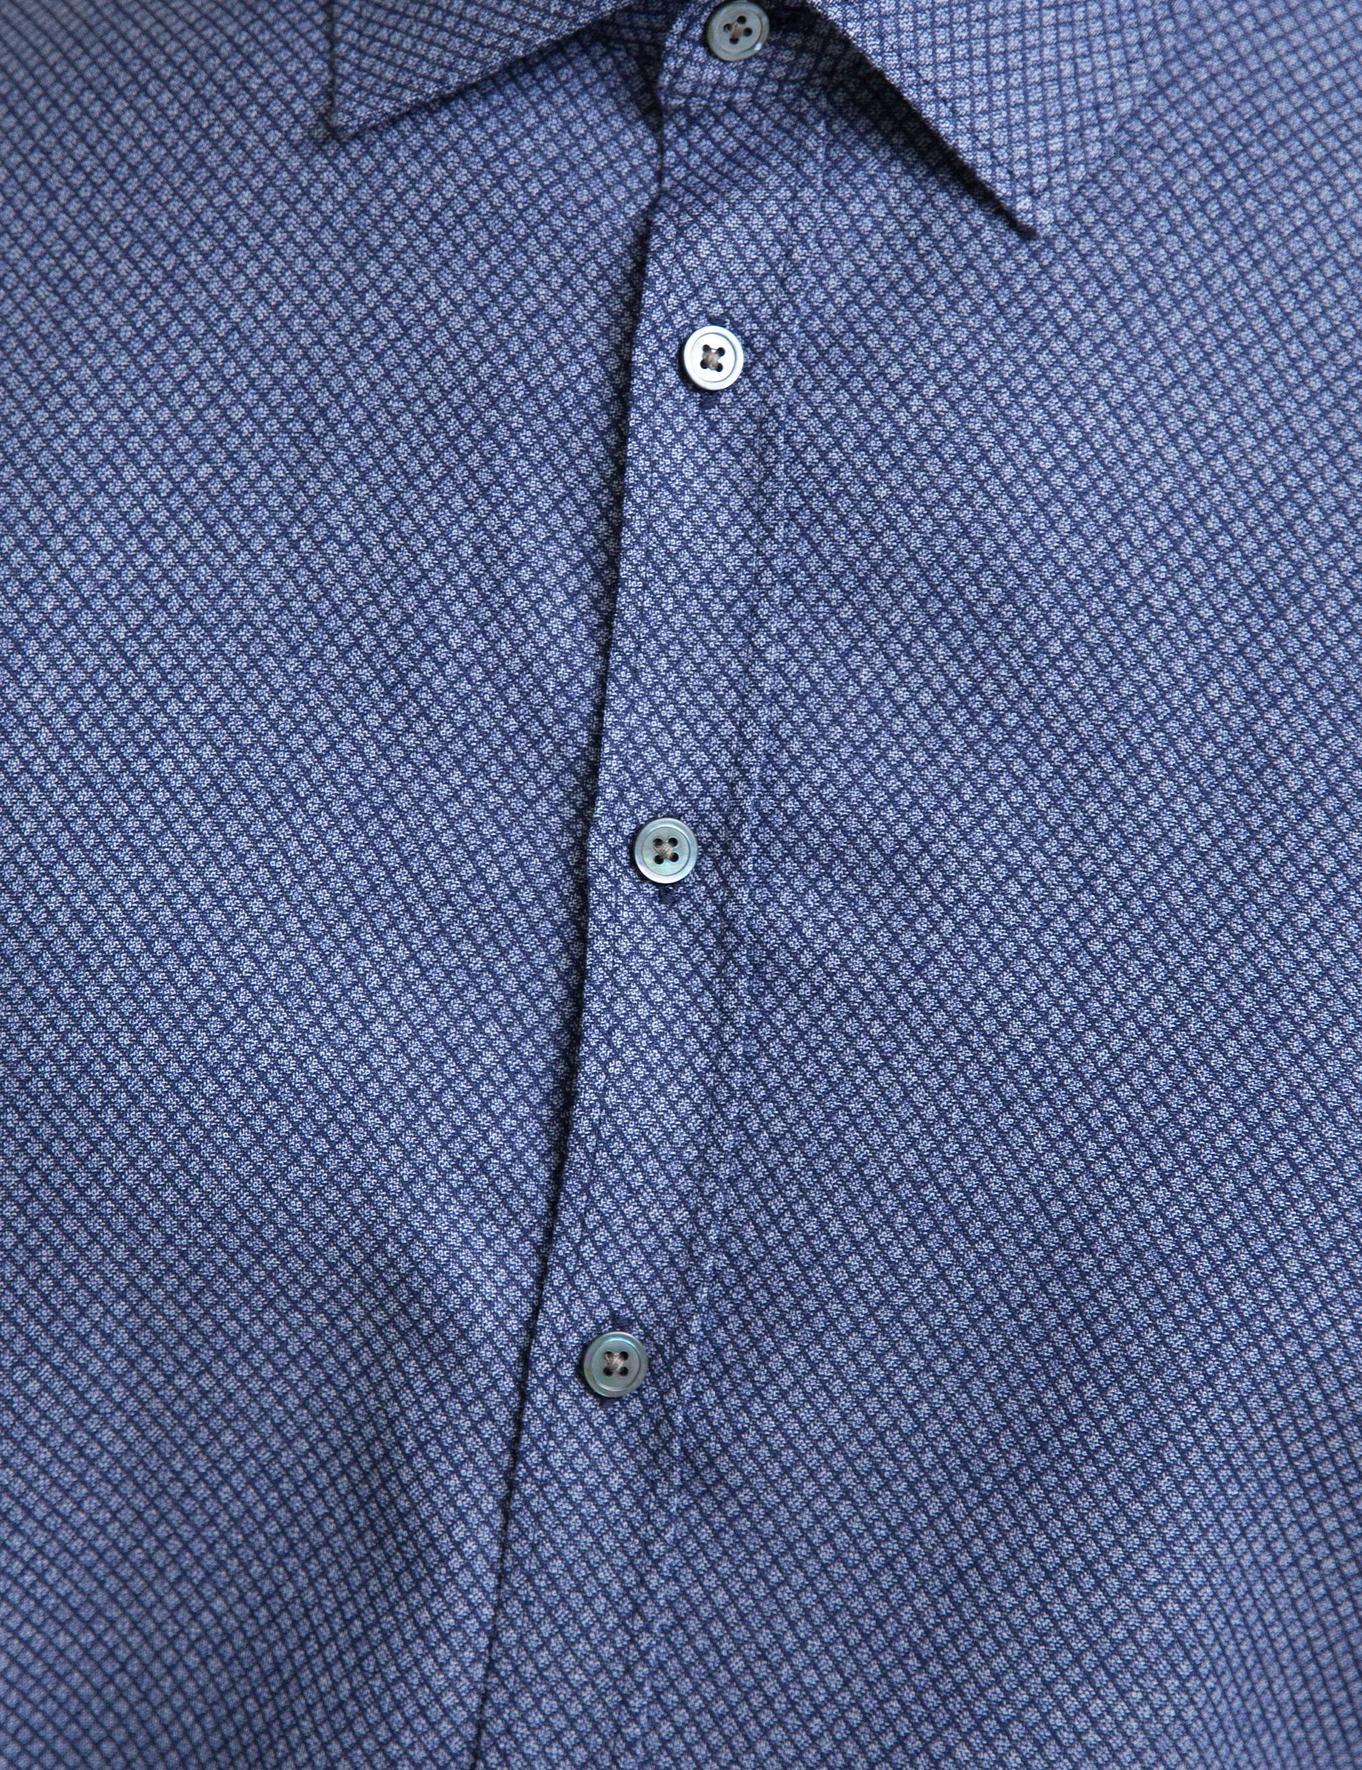 Lacivert Slim Fit Gömlek - 50192797004